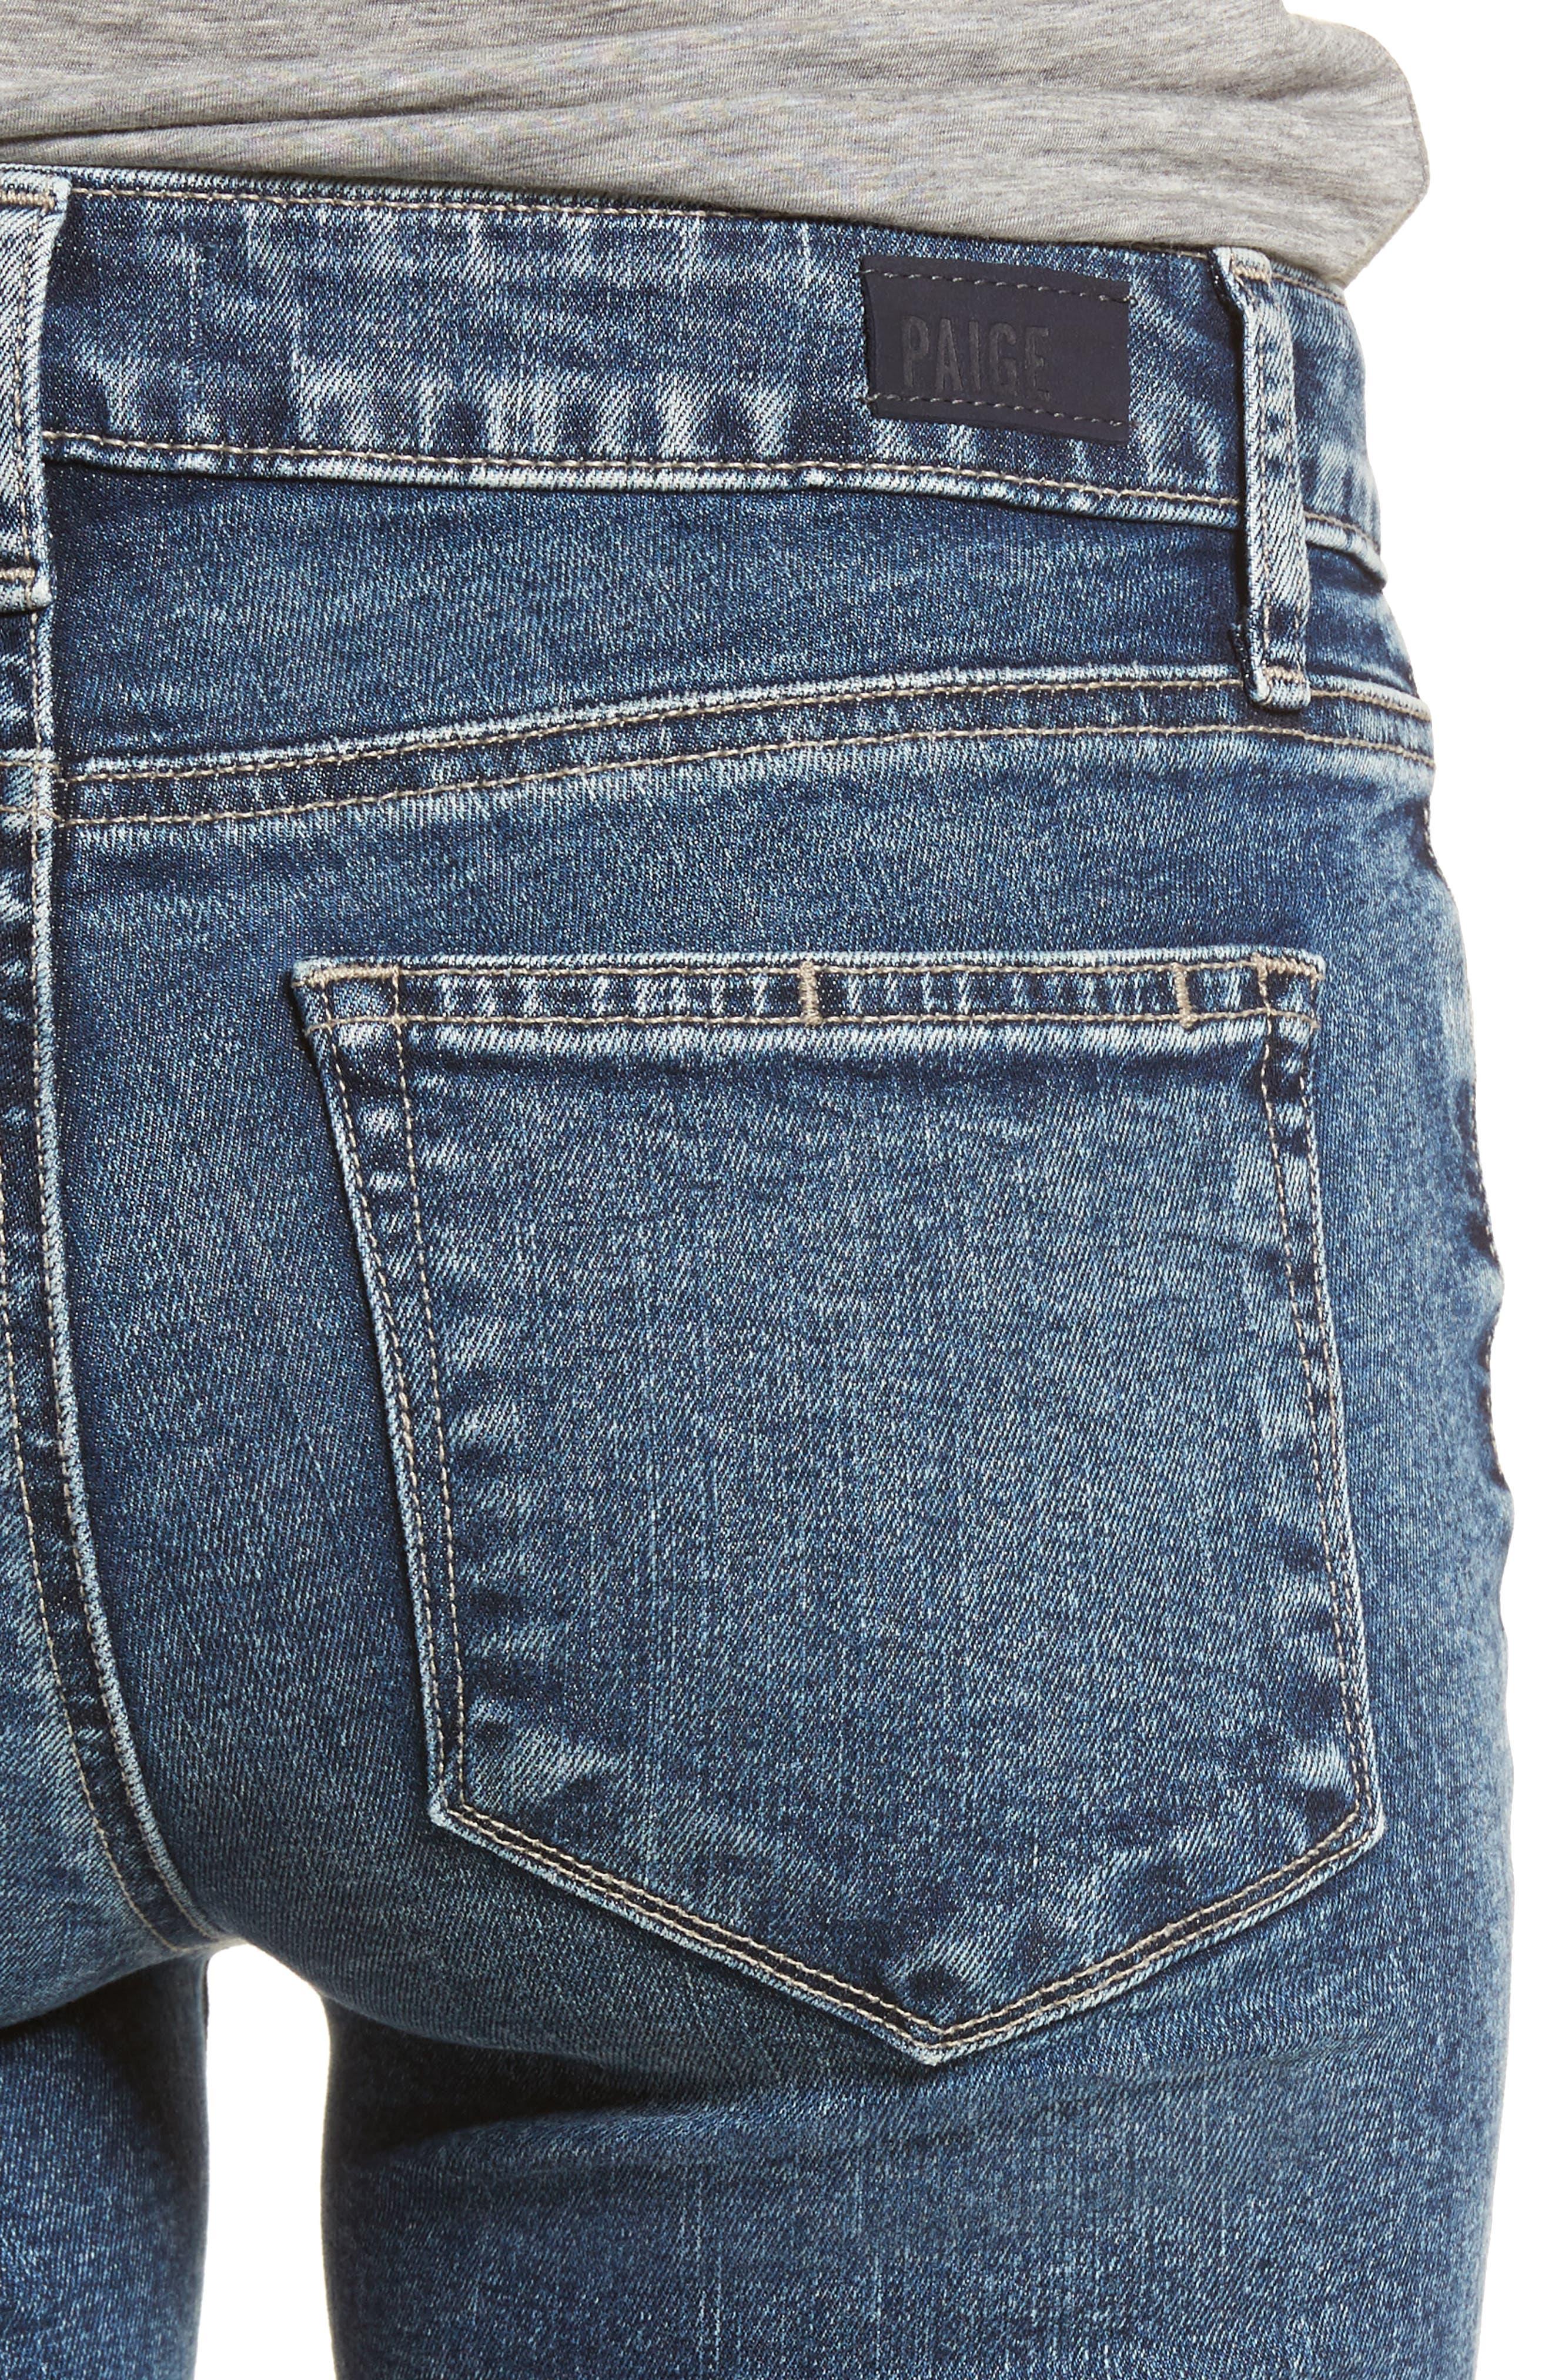 Transcend Vintage - Verdugo Ultra Skinny Jeans,                             Alternate thumbnail 4, color,                             400